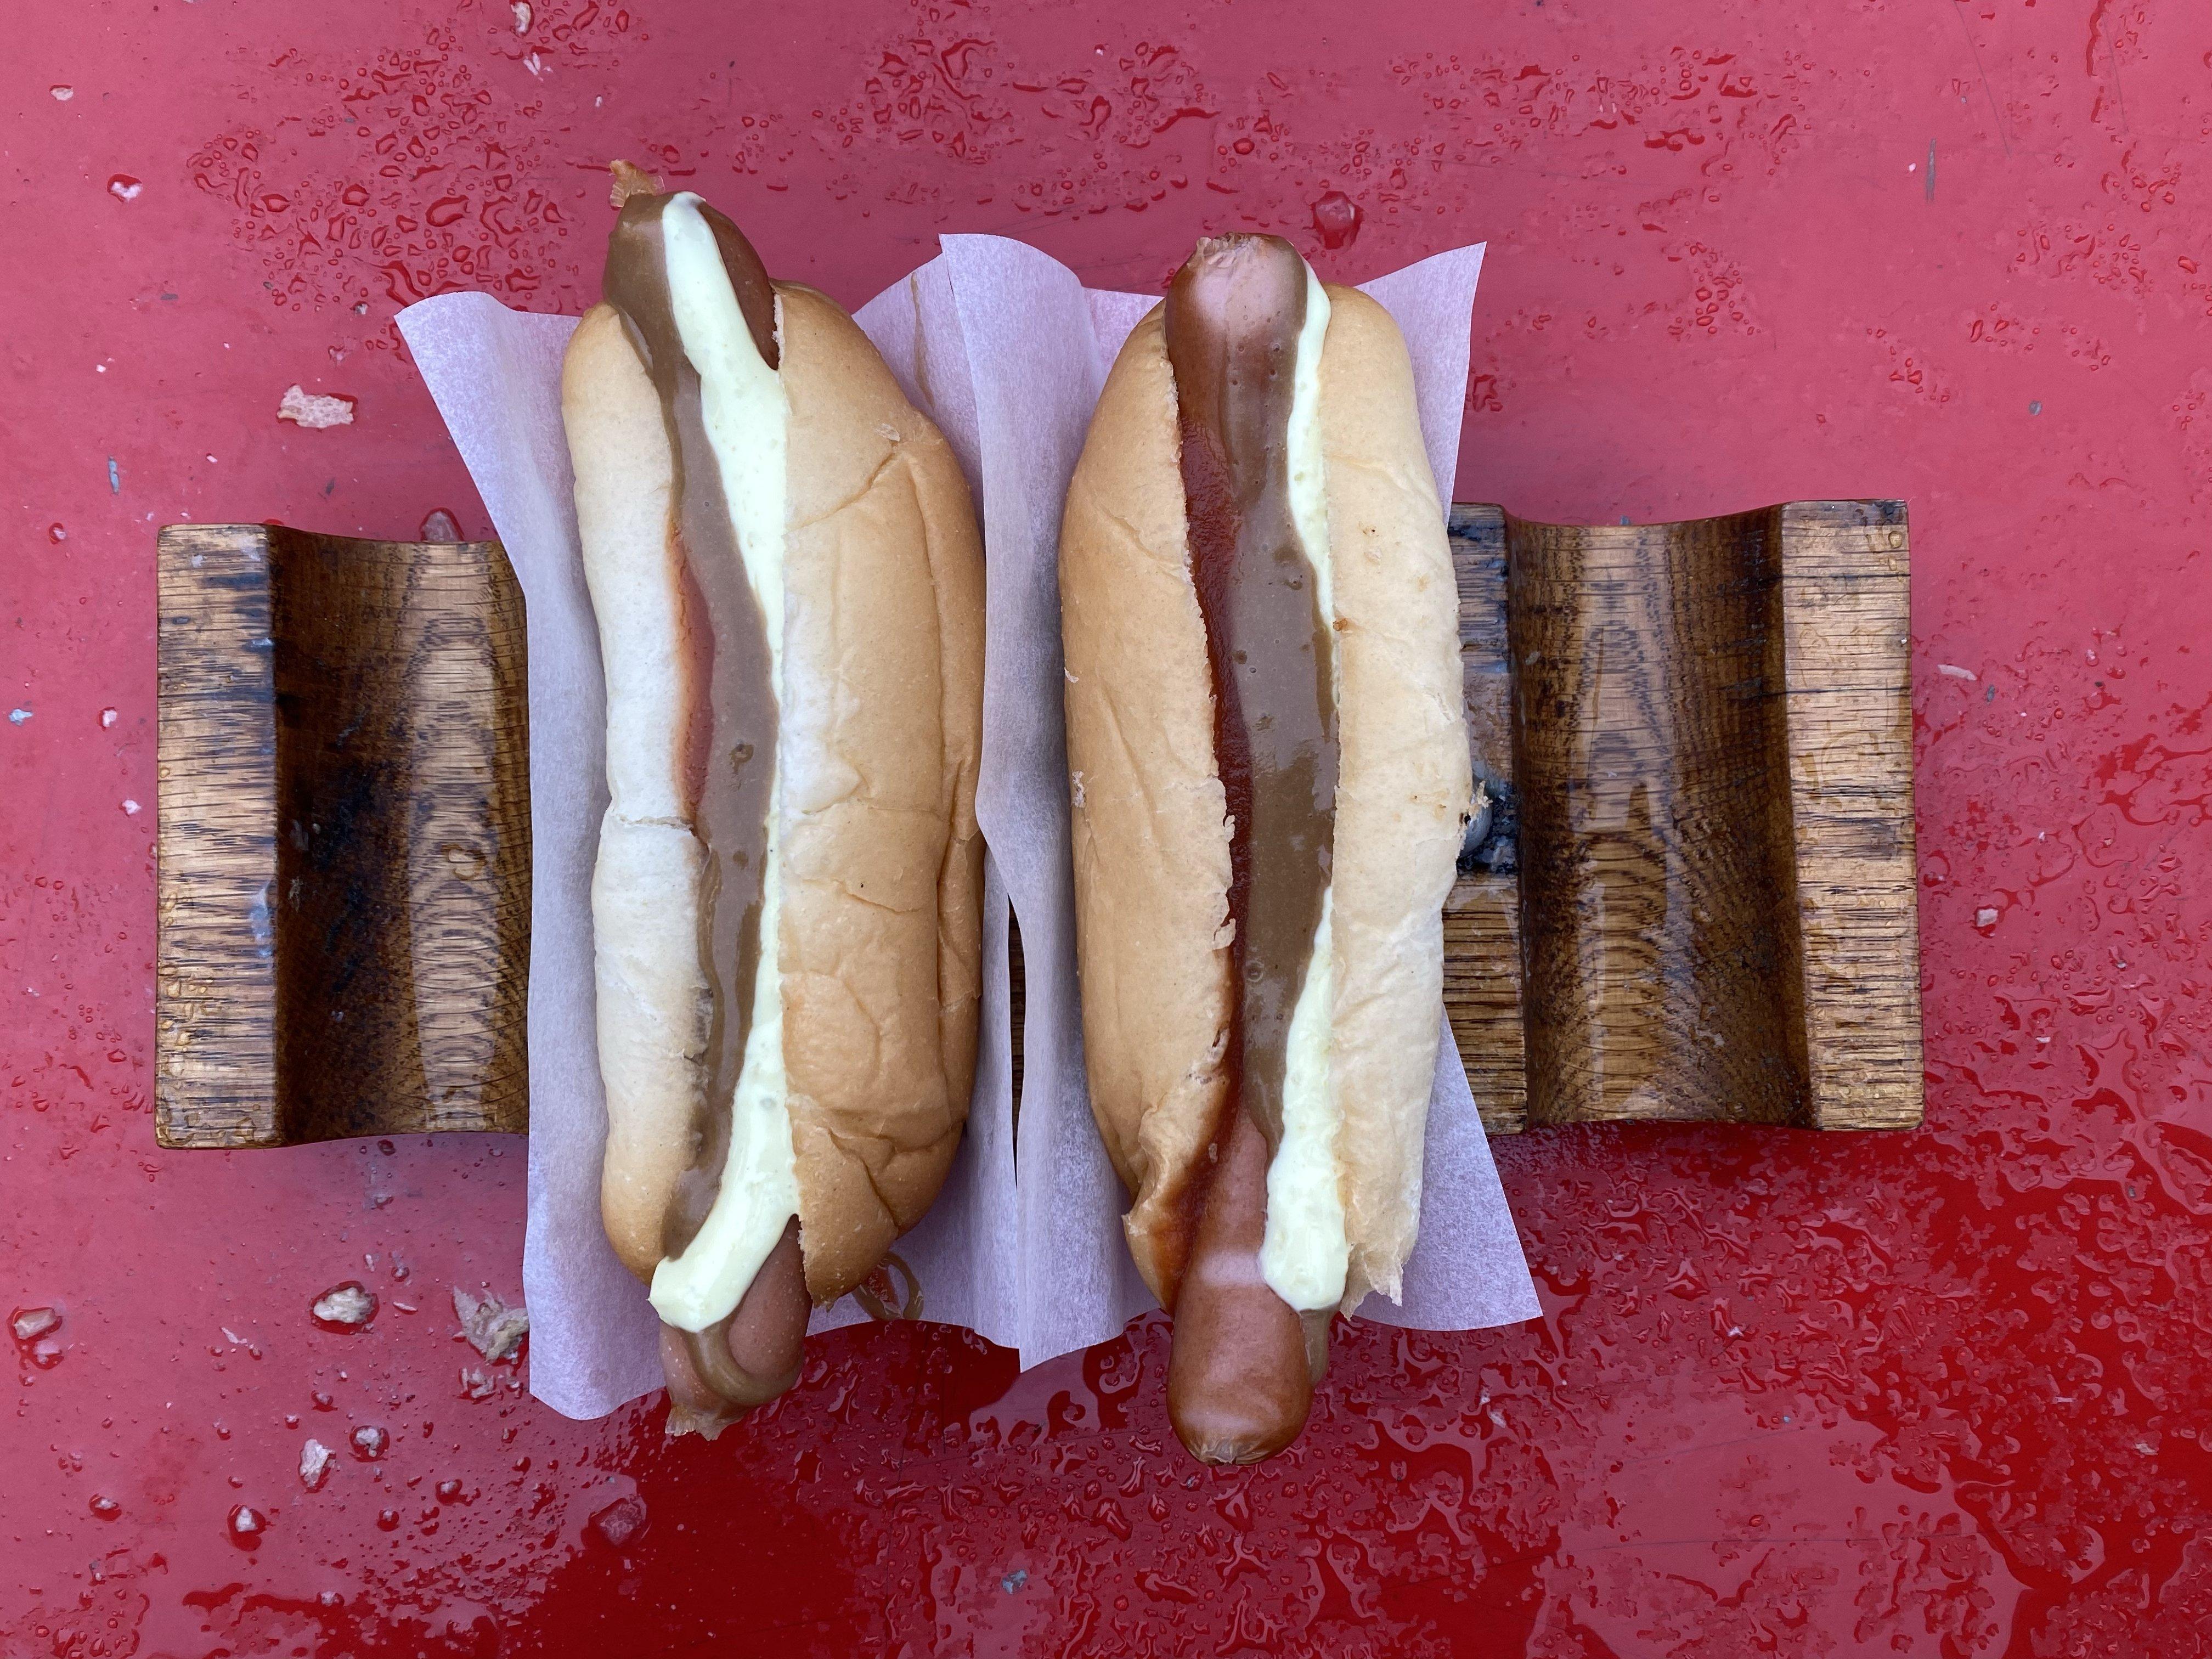 Yummy Icelandic hot dogs